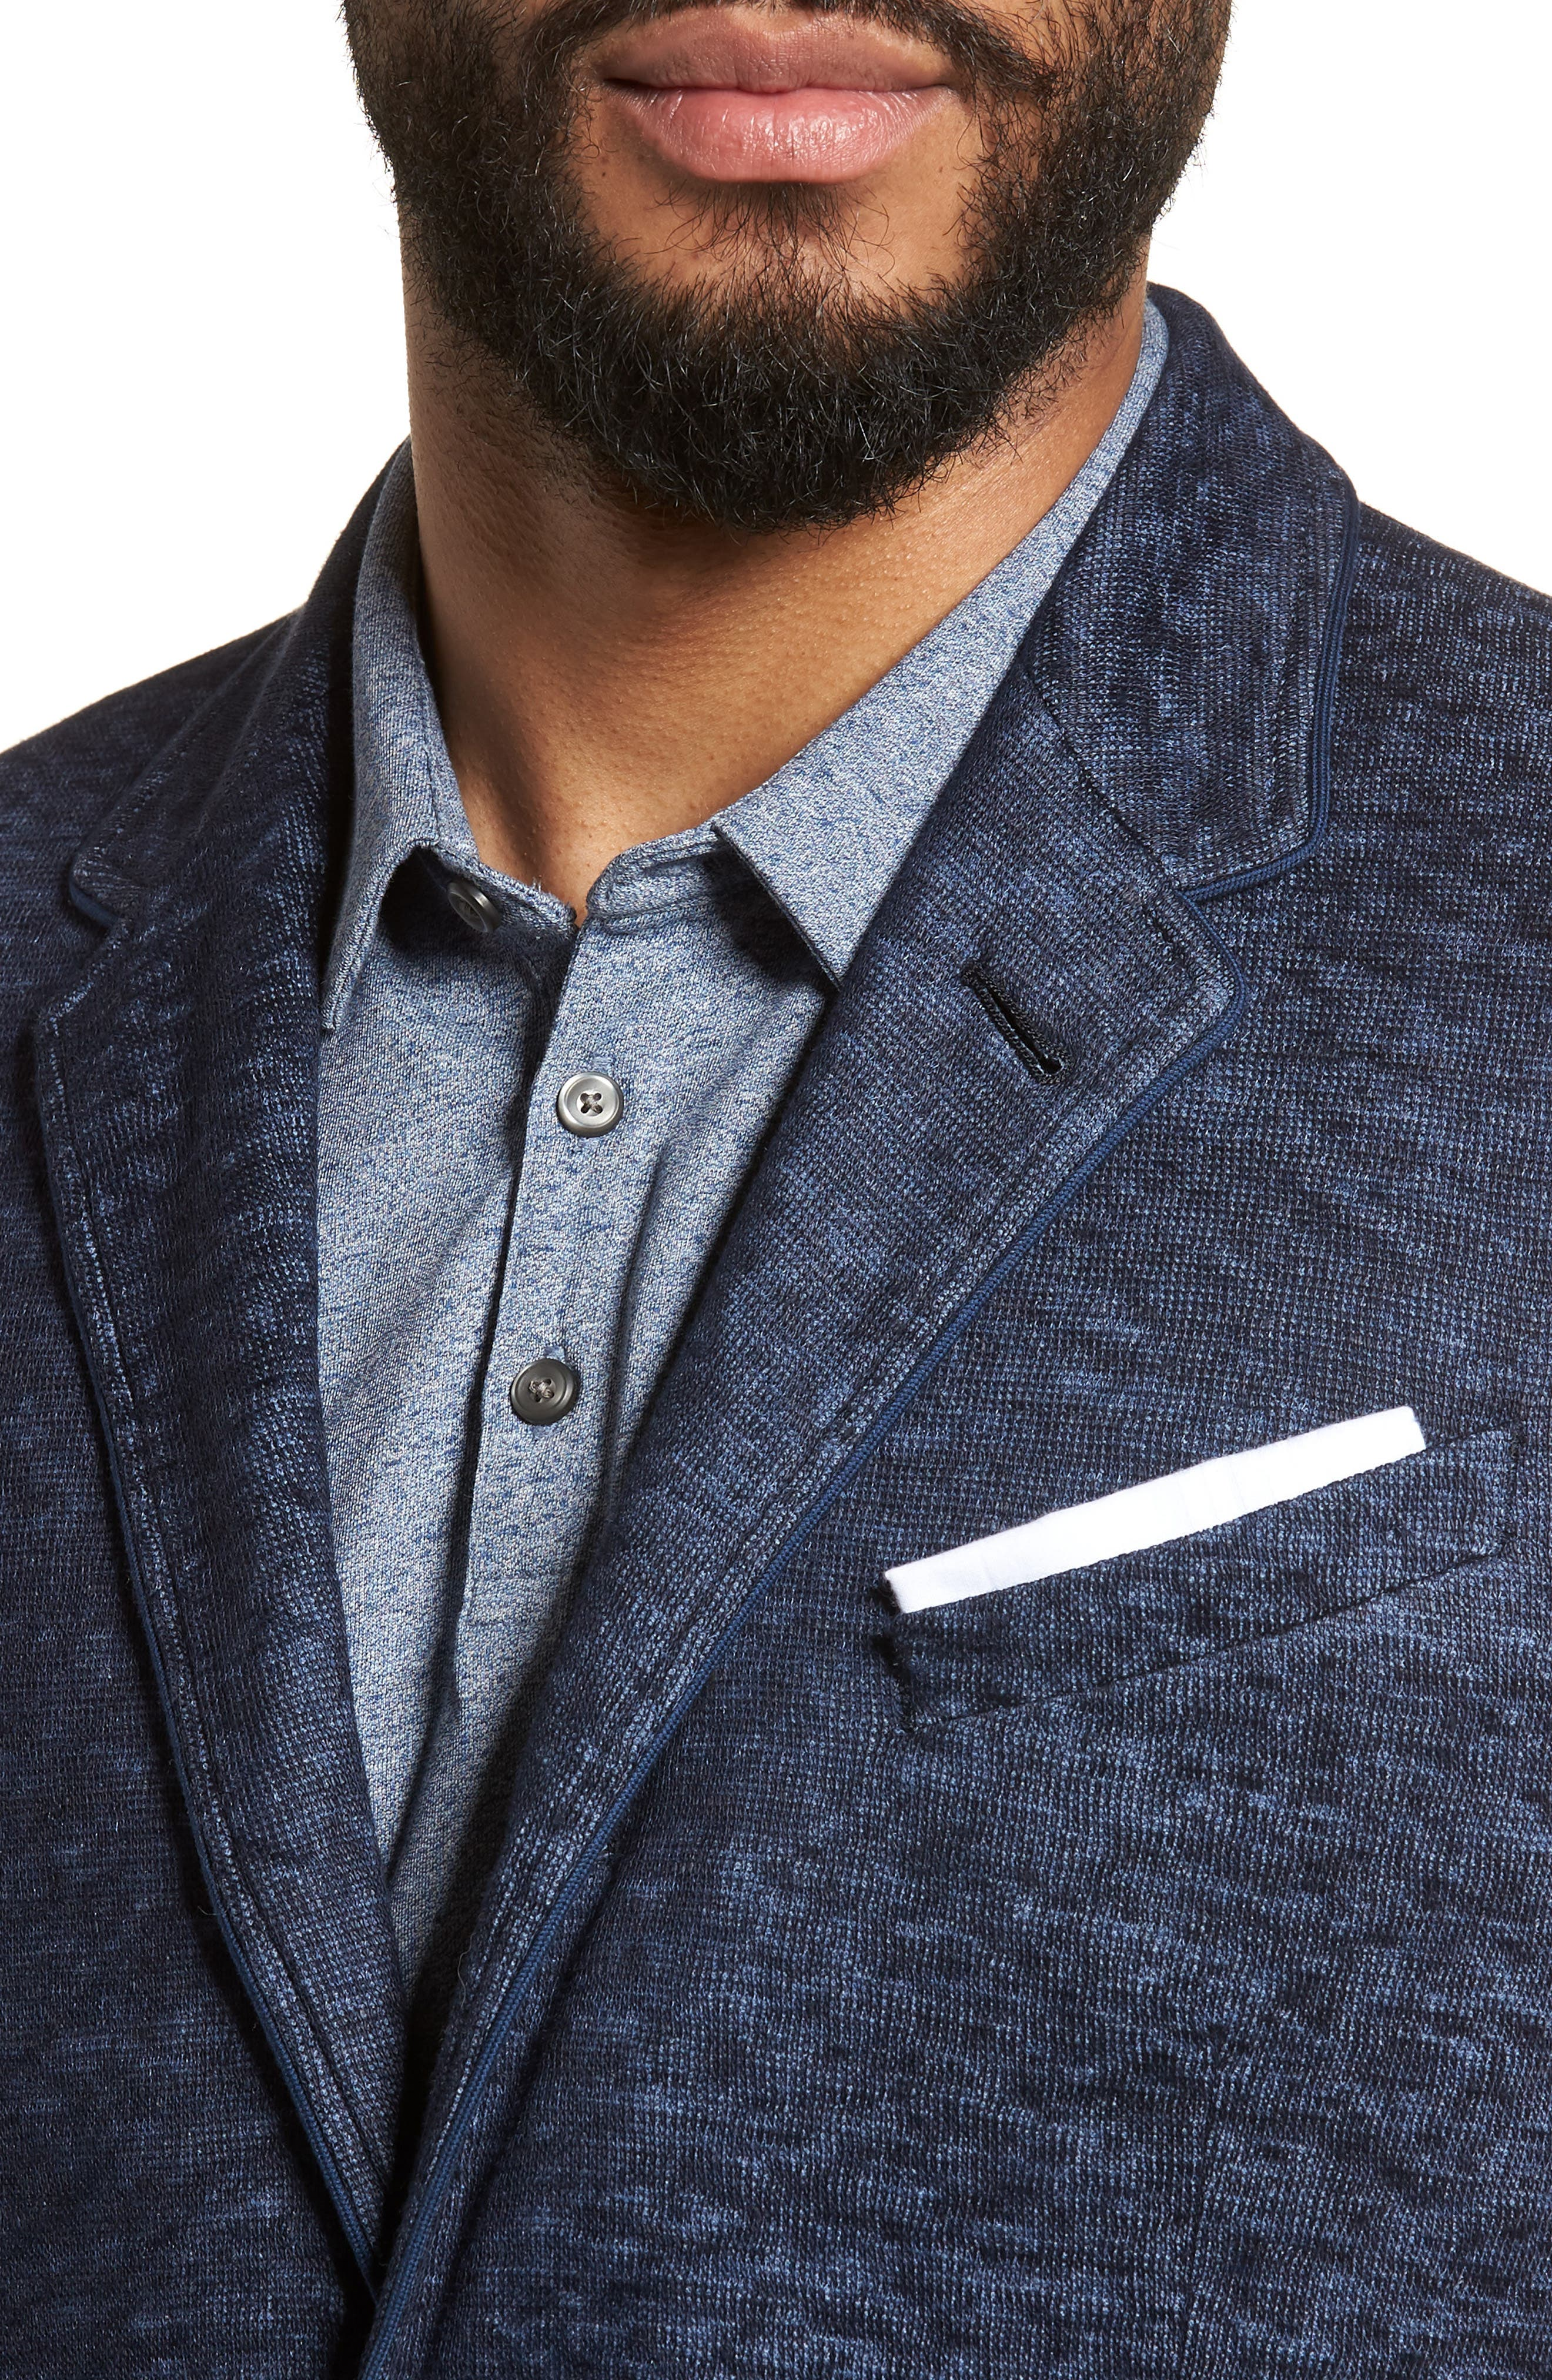 Regular Fit Cotton & Linen Blazer,                             Alternate thumbnail 4, color,                             406